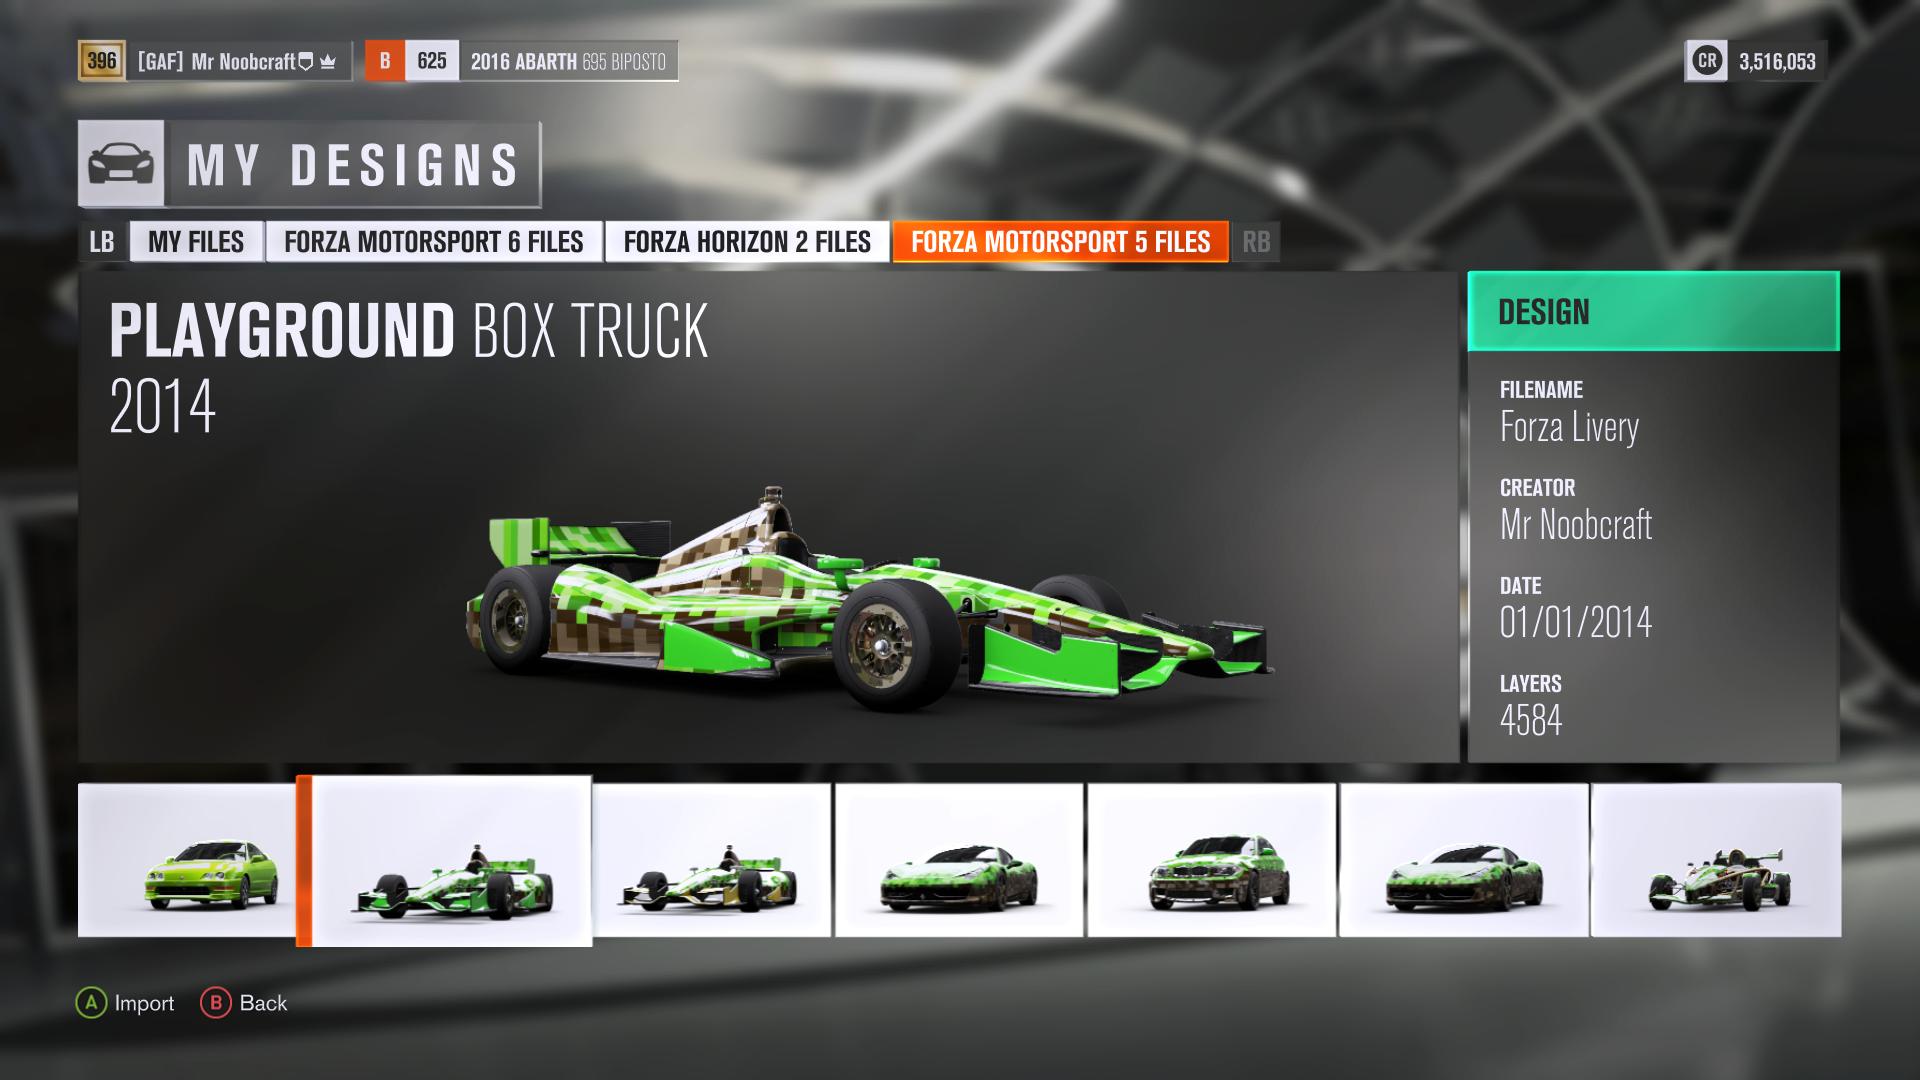 Forza Horizon 4 Credits 10m-$1.25